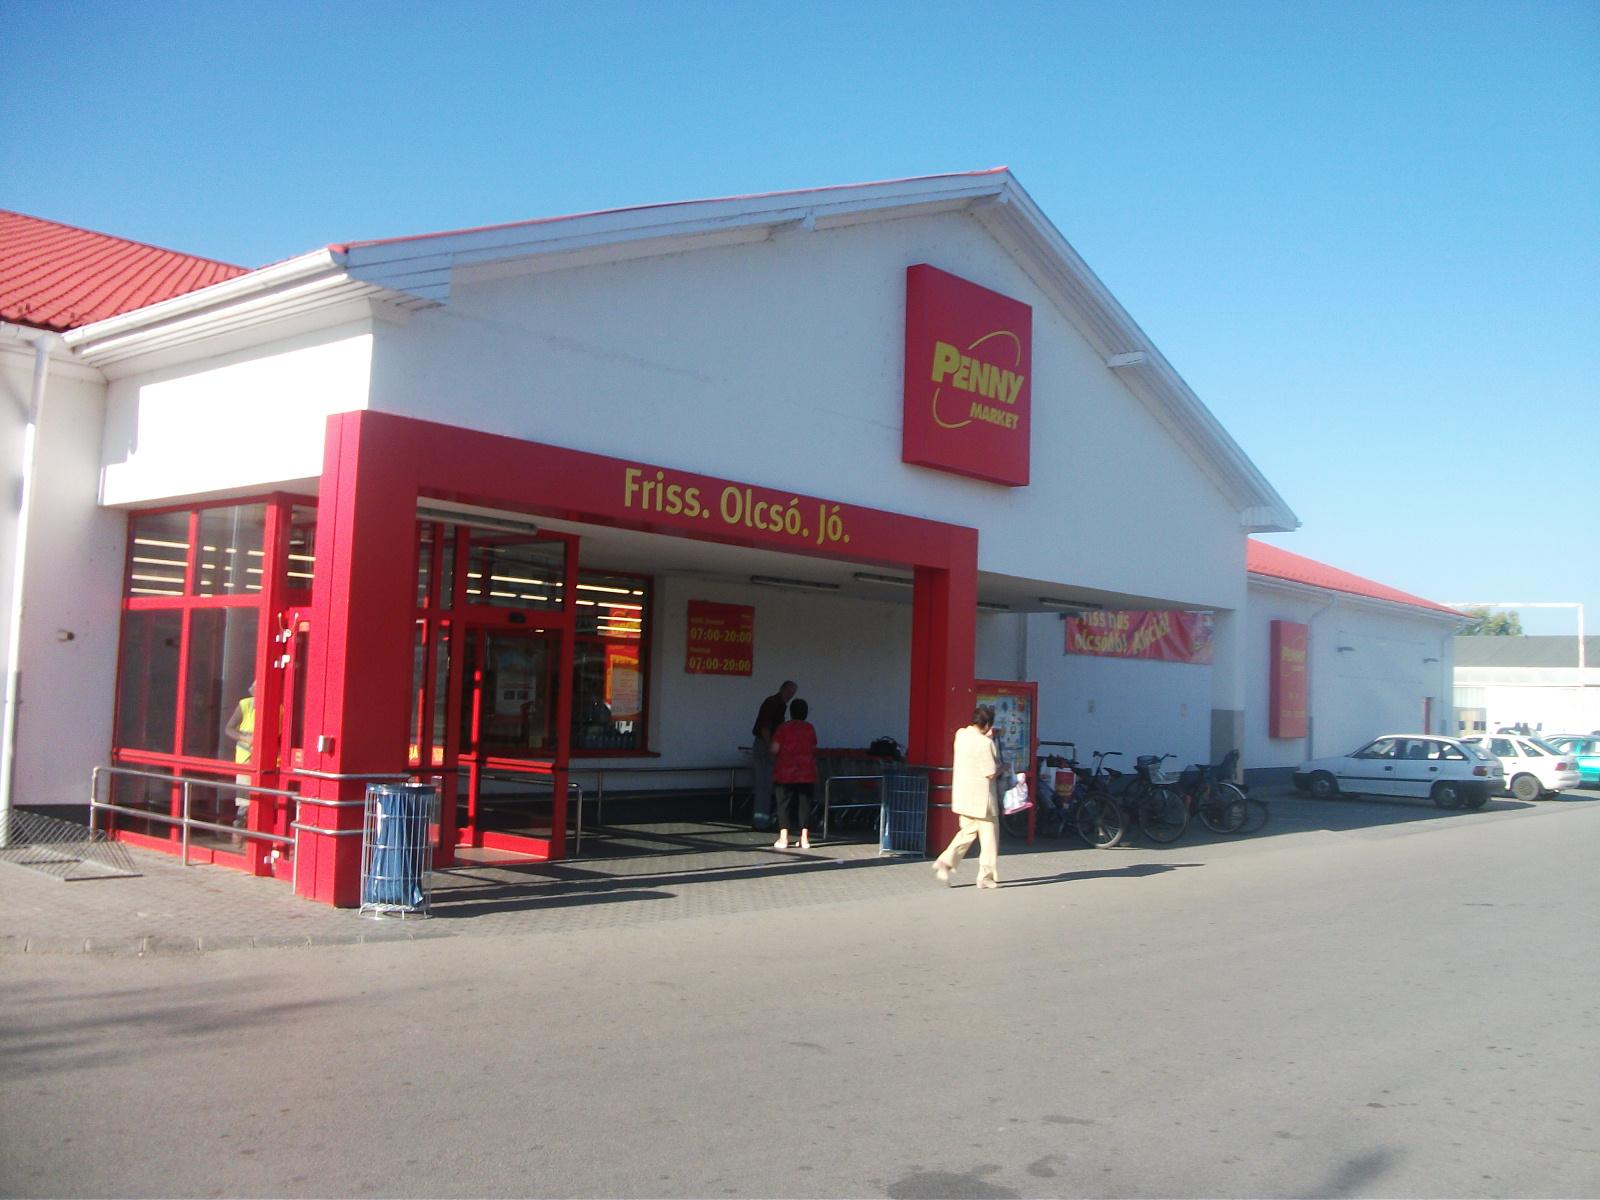 Supermarkt Penny